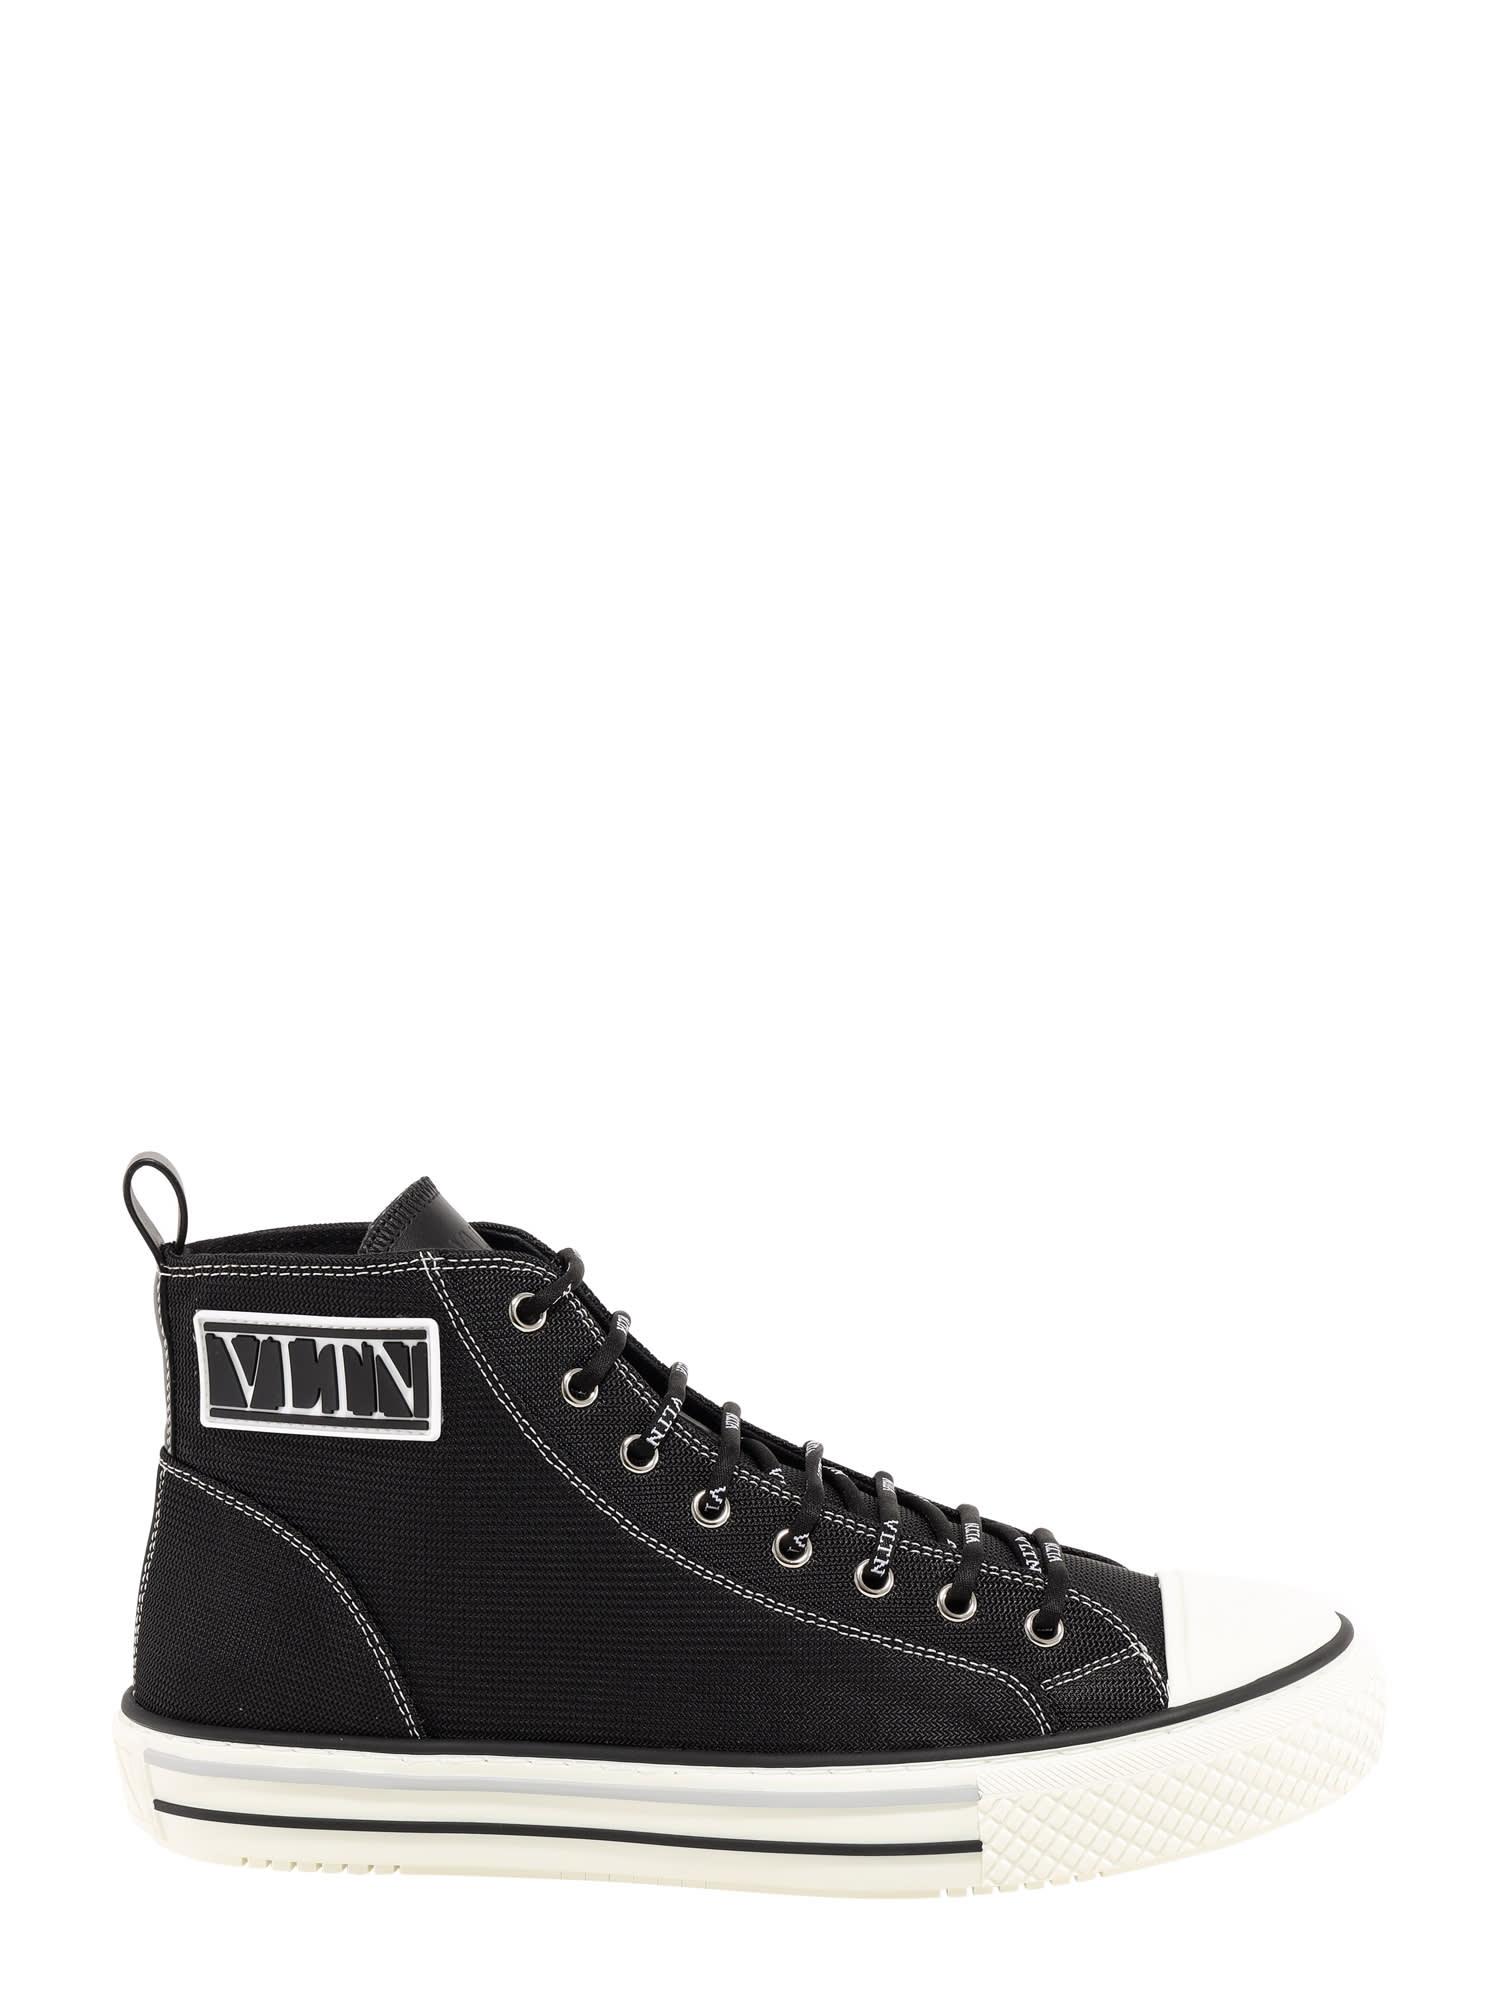 Valentino Garavani Giggies Sneakers